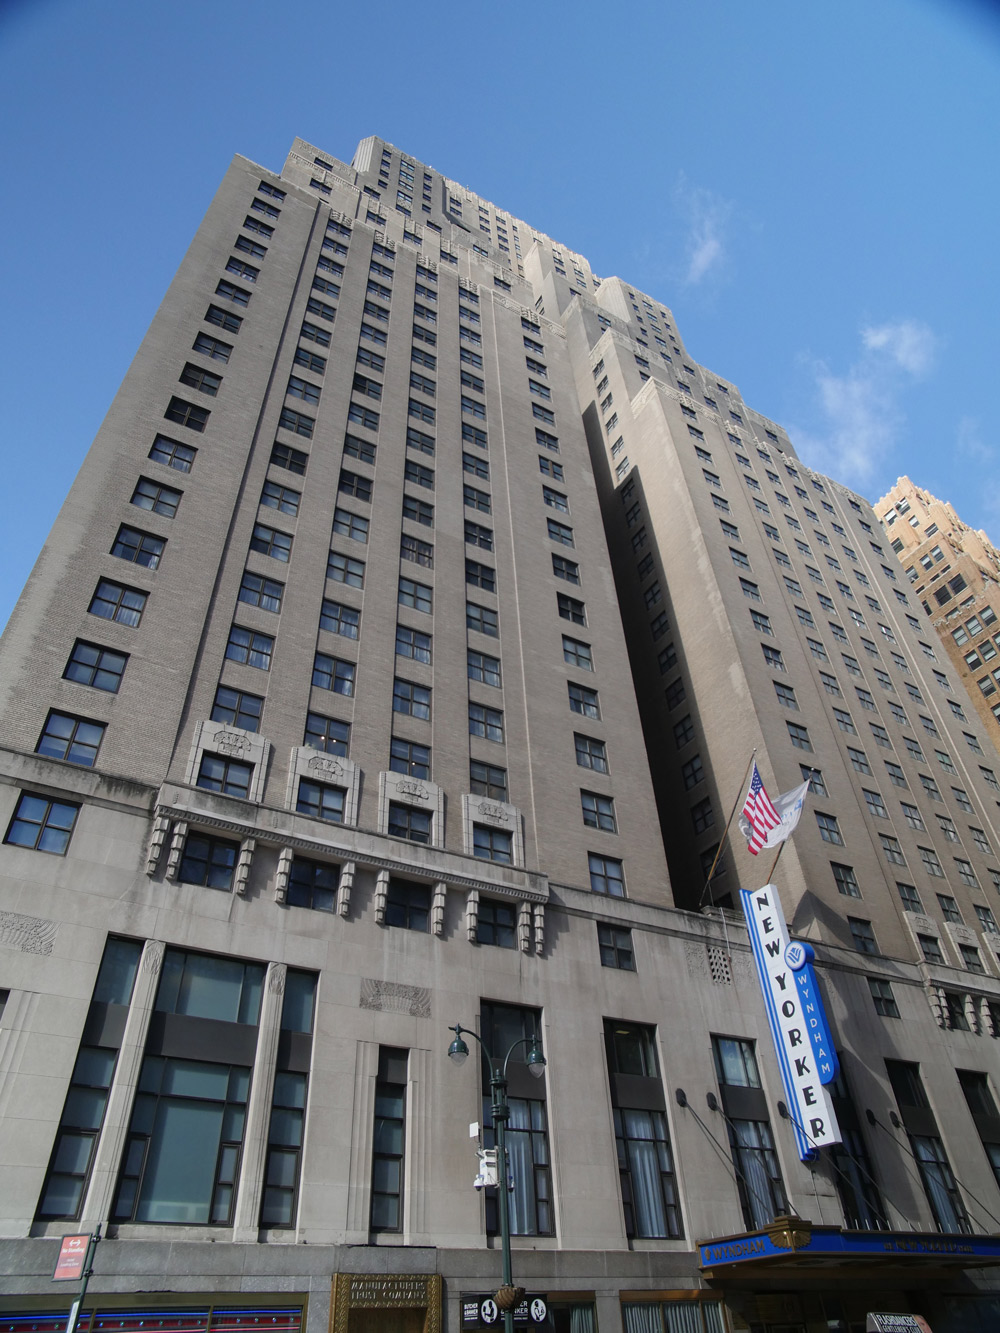 The New Yorker Hotel Skyline Restoration